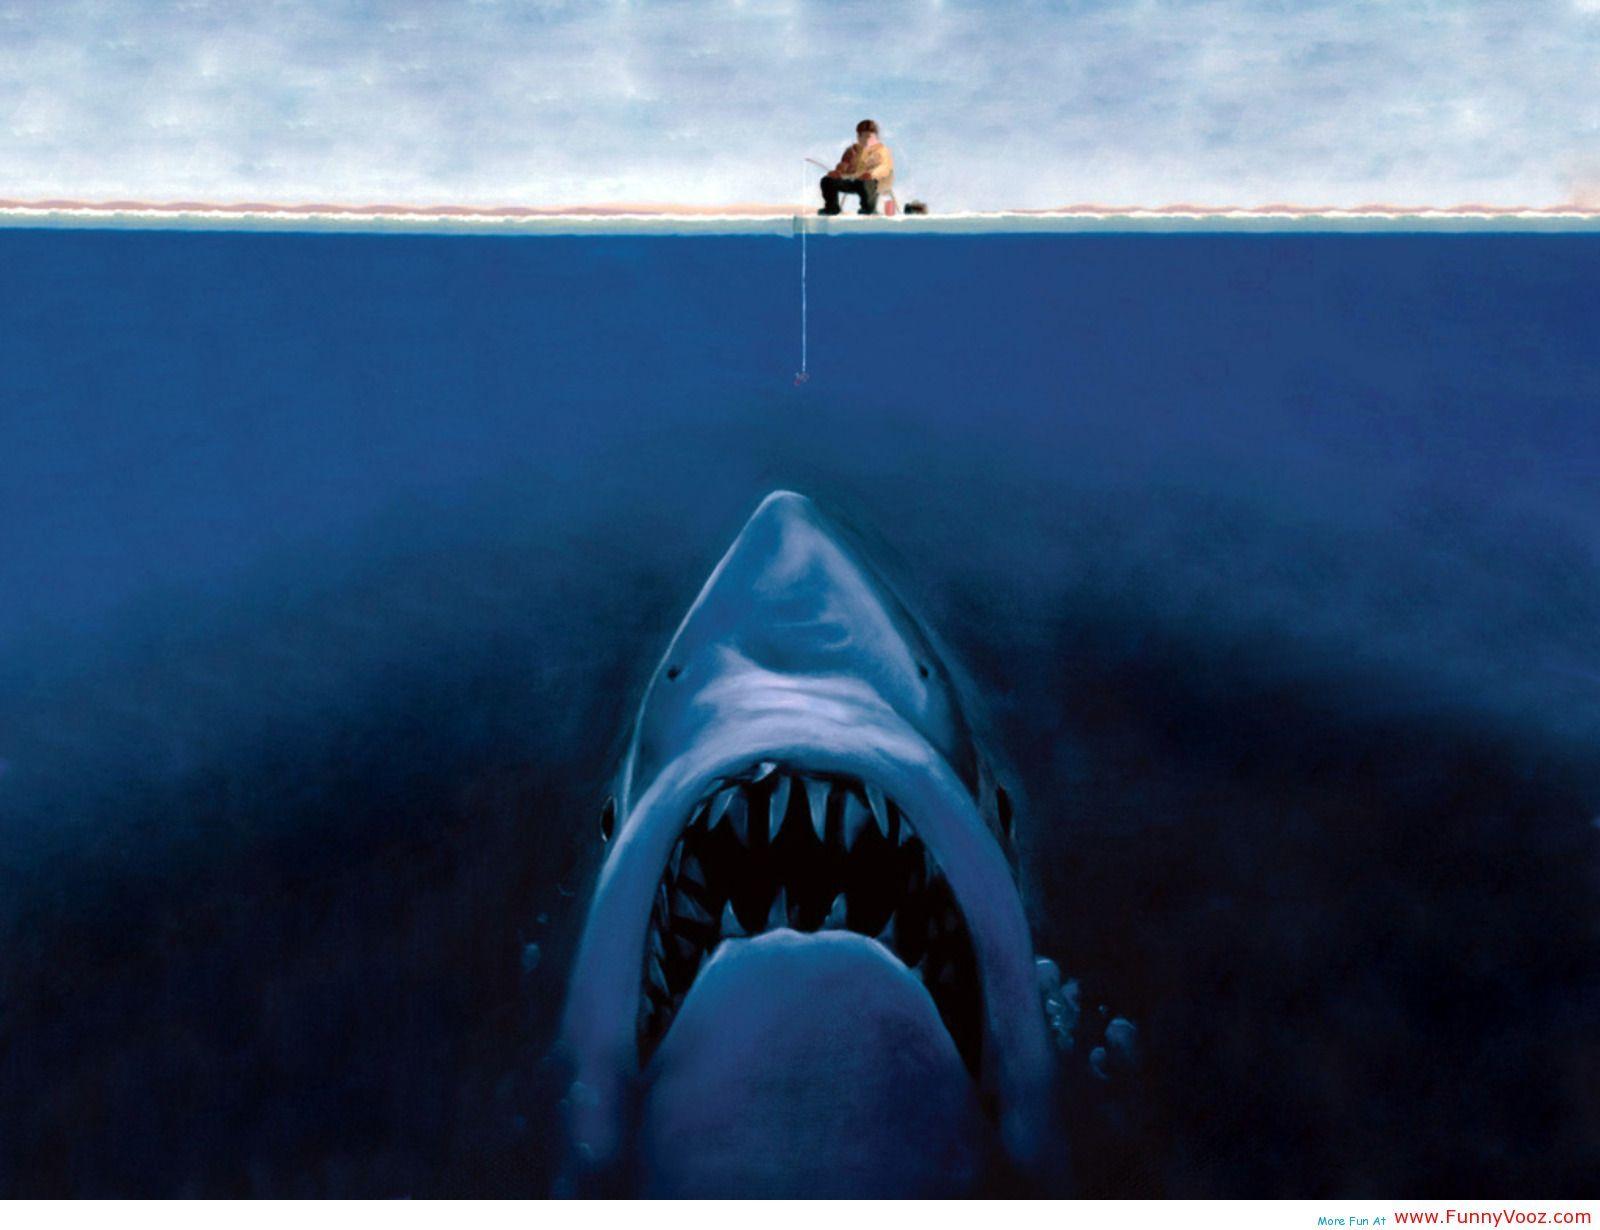 3d Shark Optical Illusions Blue Shark Fish Eat A Man Funny Wallpapers Funny Vooz Sharks Funny Funny Wallpapers Funny Wallpaper